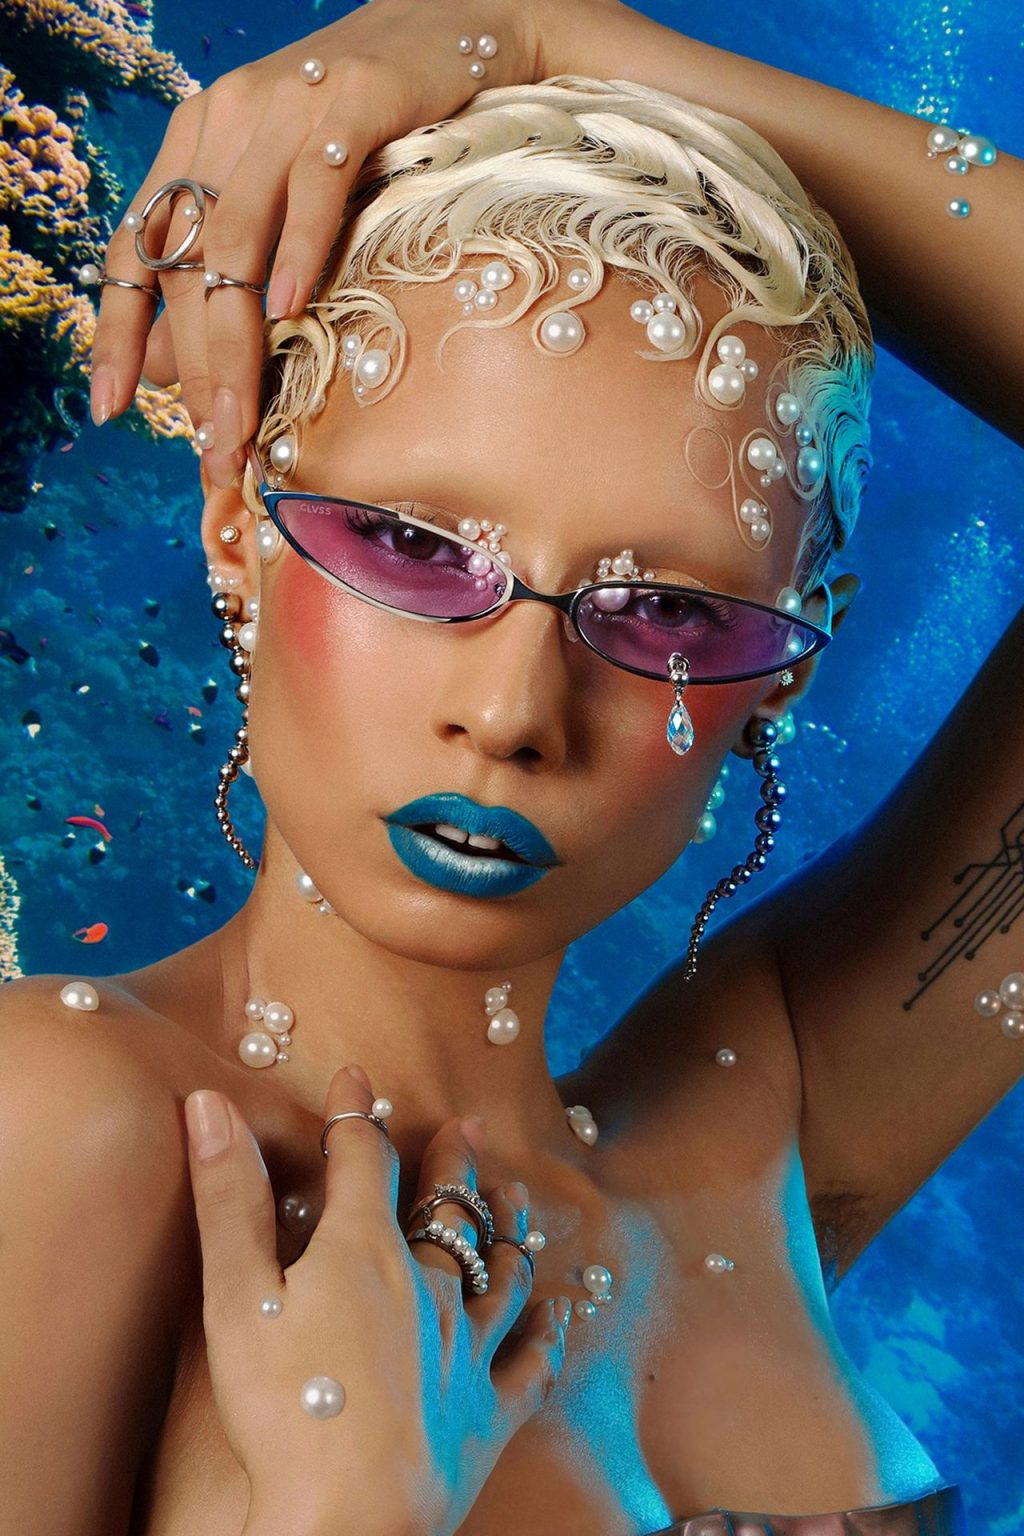 Jazzelle Zanaughtti Poses for CHRISHBAN's New Eyewear Collection (8 Photos)